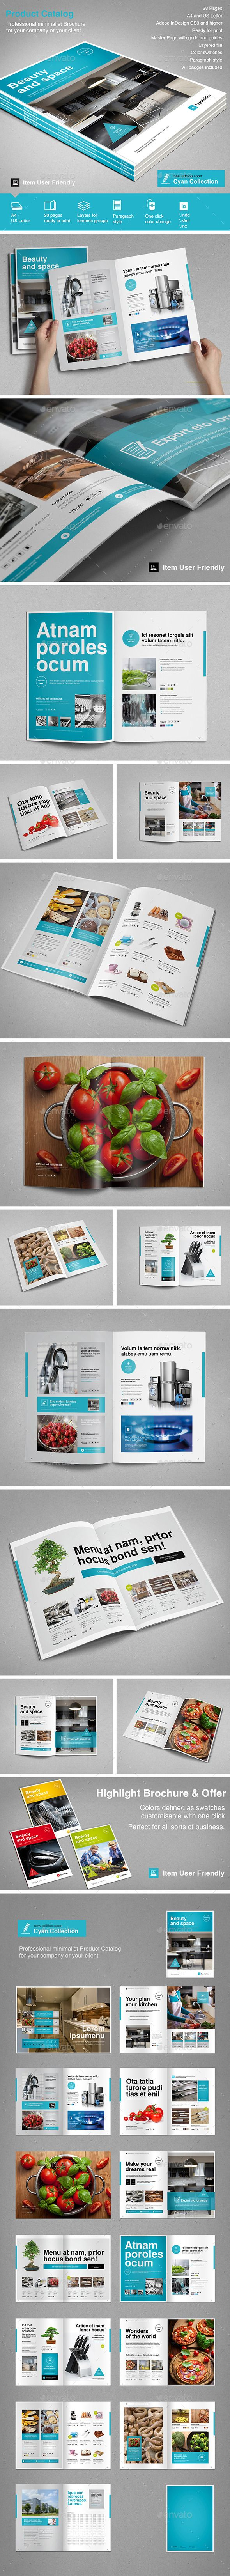 Product Catalog | Catálogo, Portafolio y Folletos